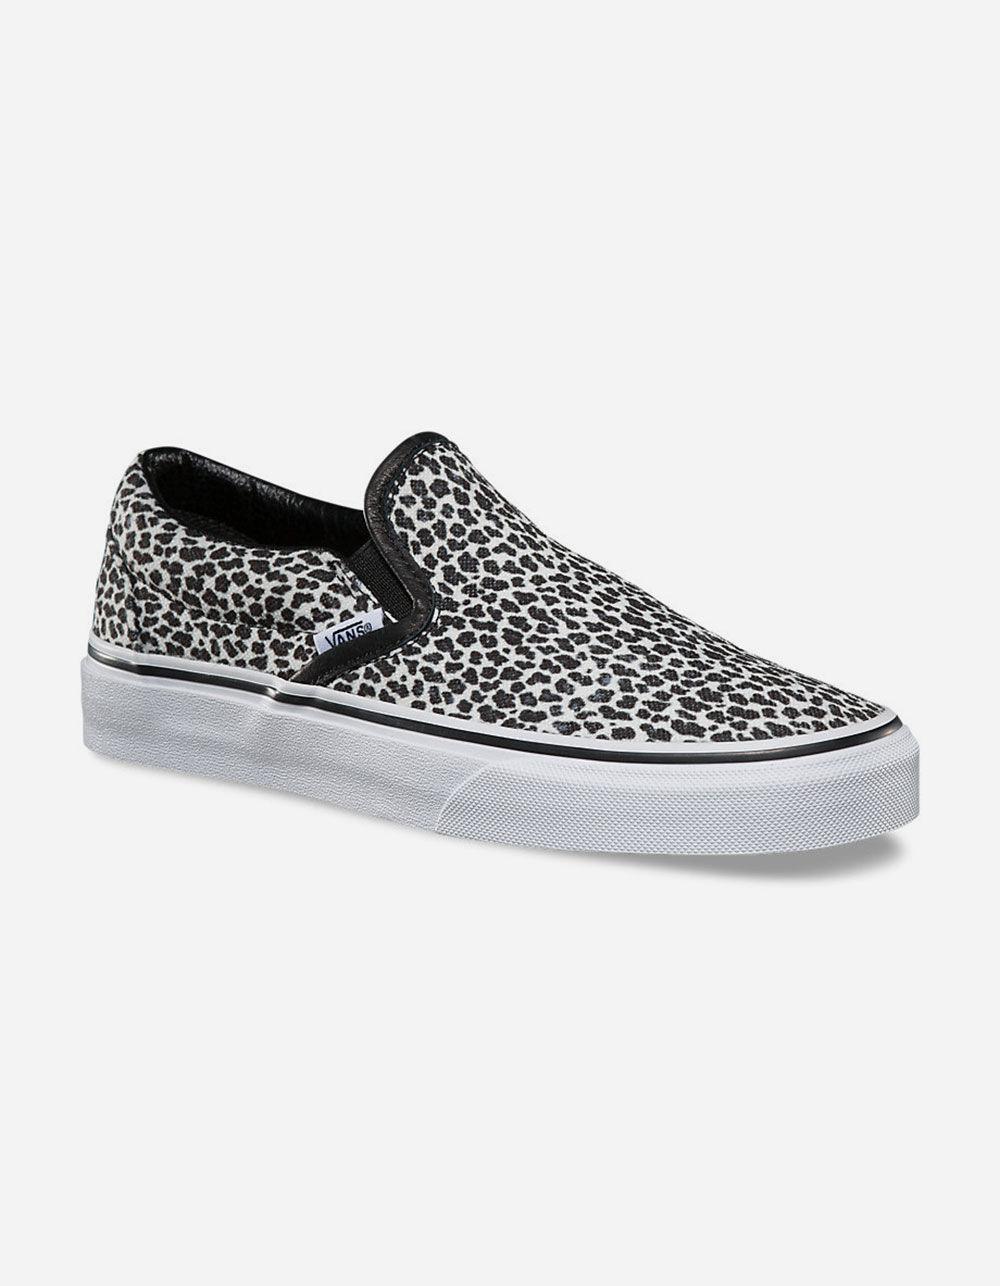 2404b74ee13e Vans Mini Leopard Classic Slip-on Womens Shoes in Black - Lyst